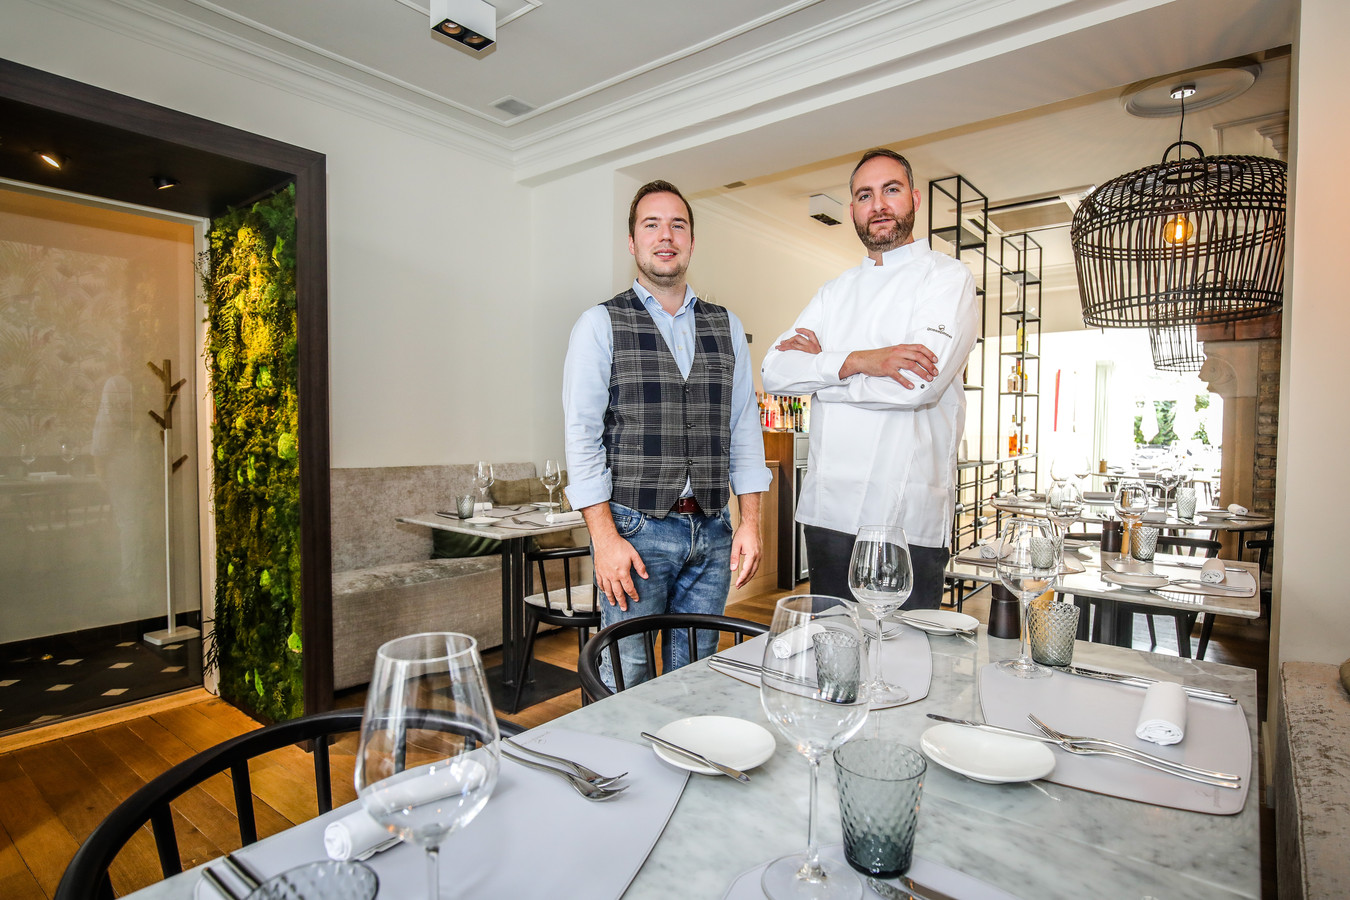 Yentl Versyp en Jan Supply in restaurant Goesepitte43.